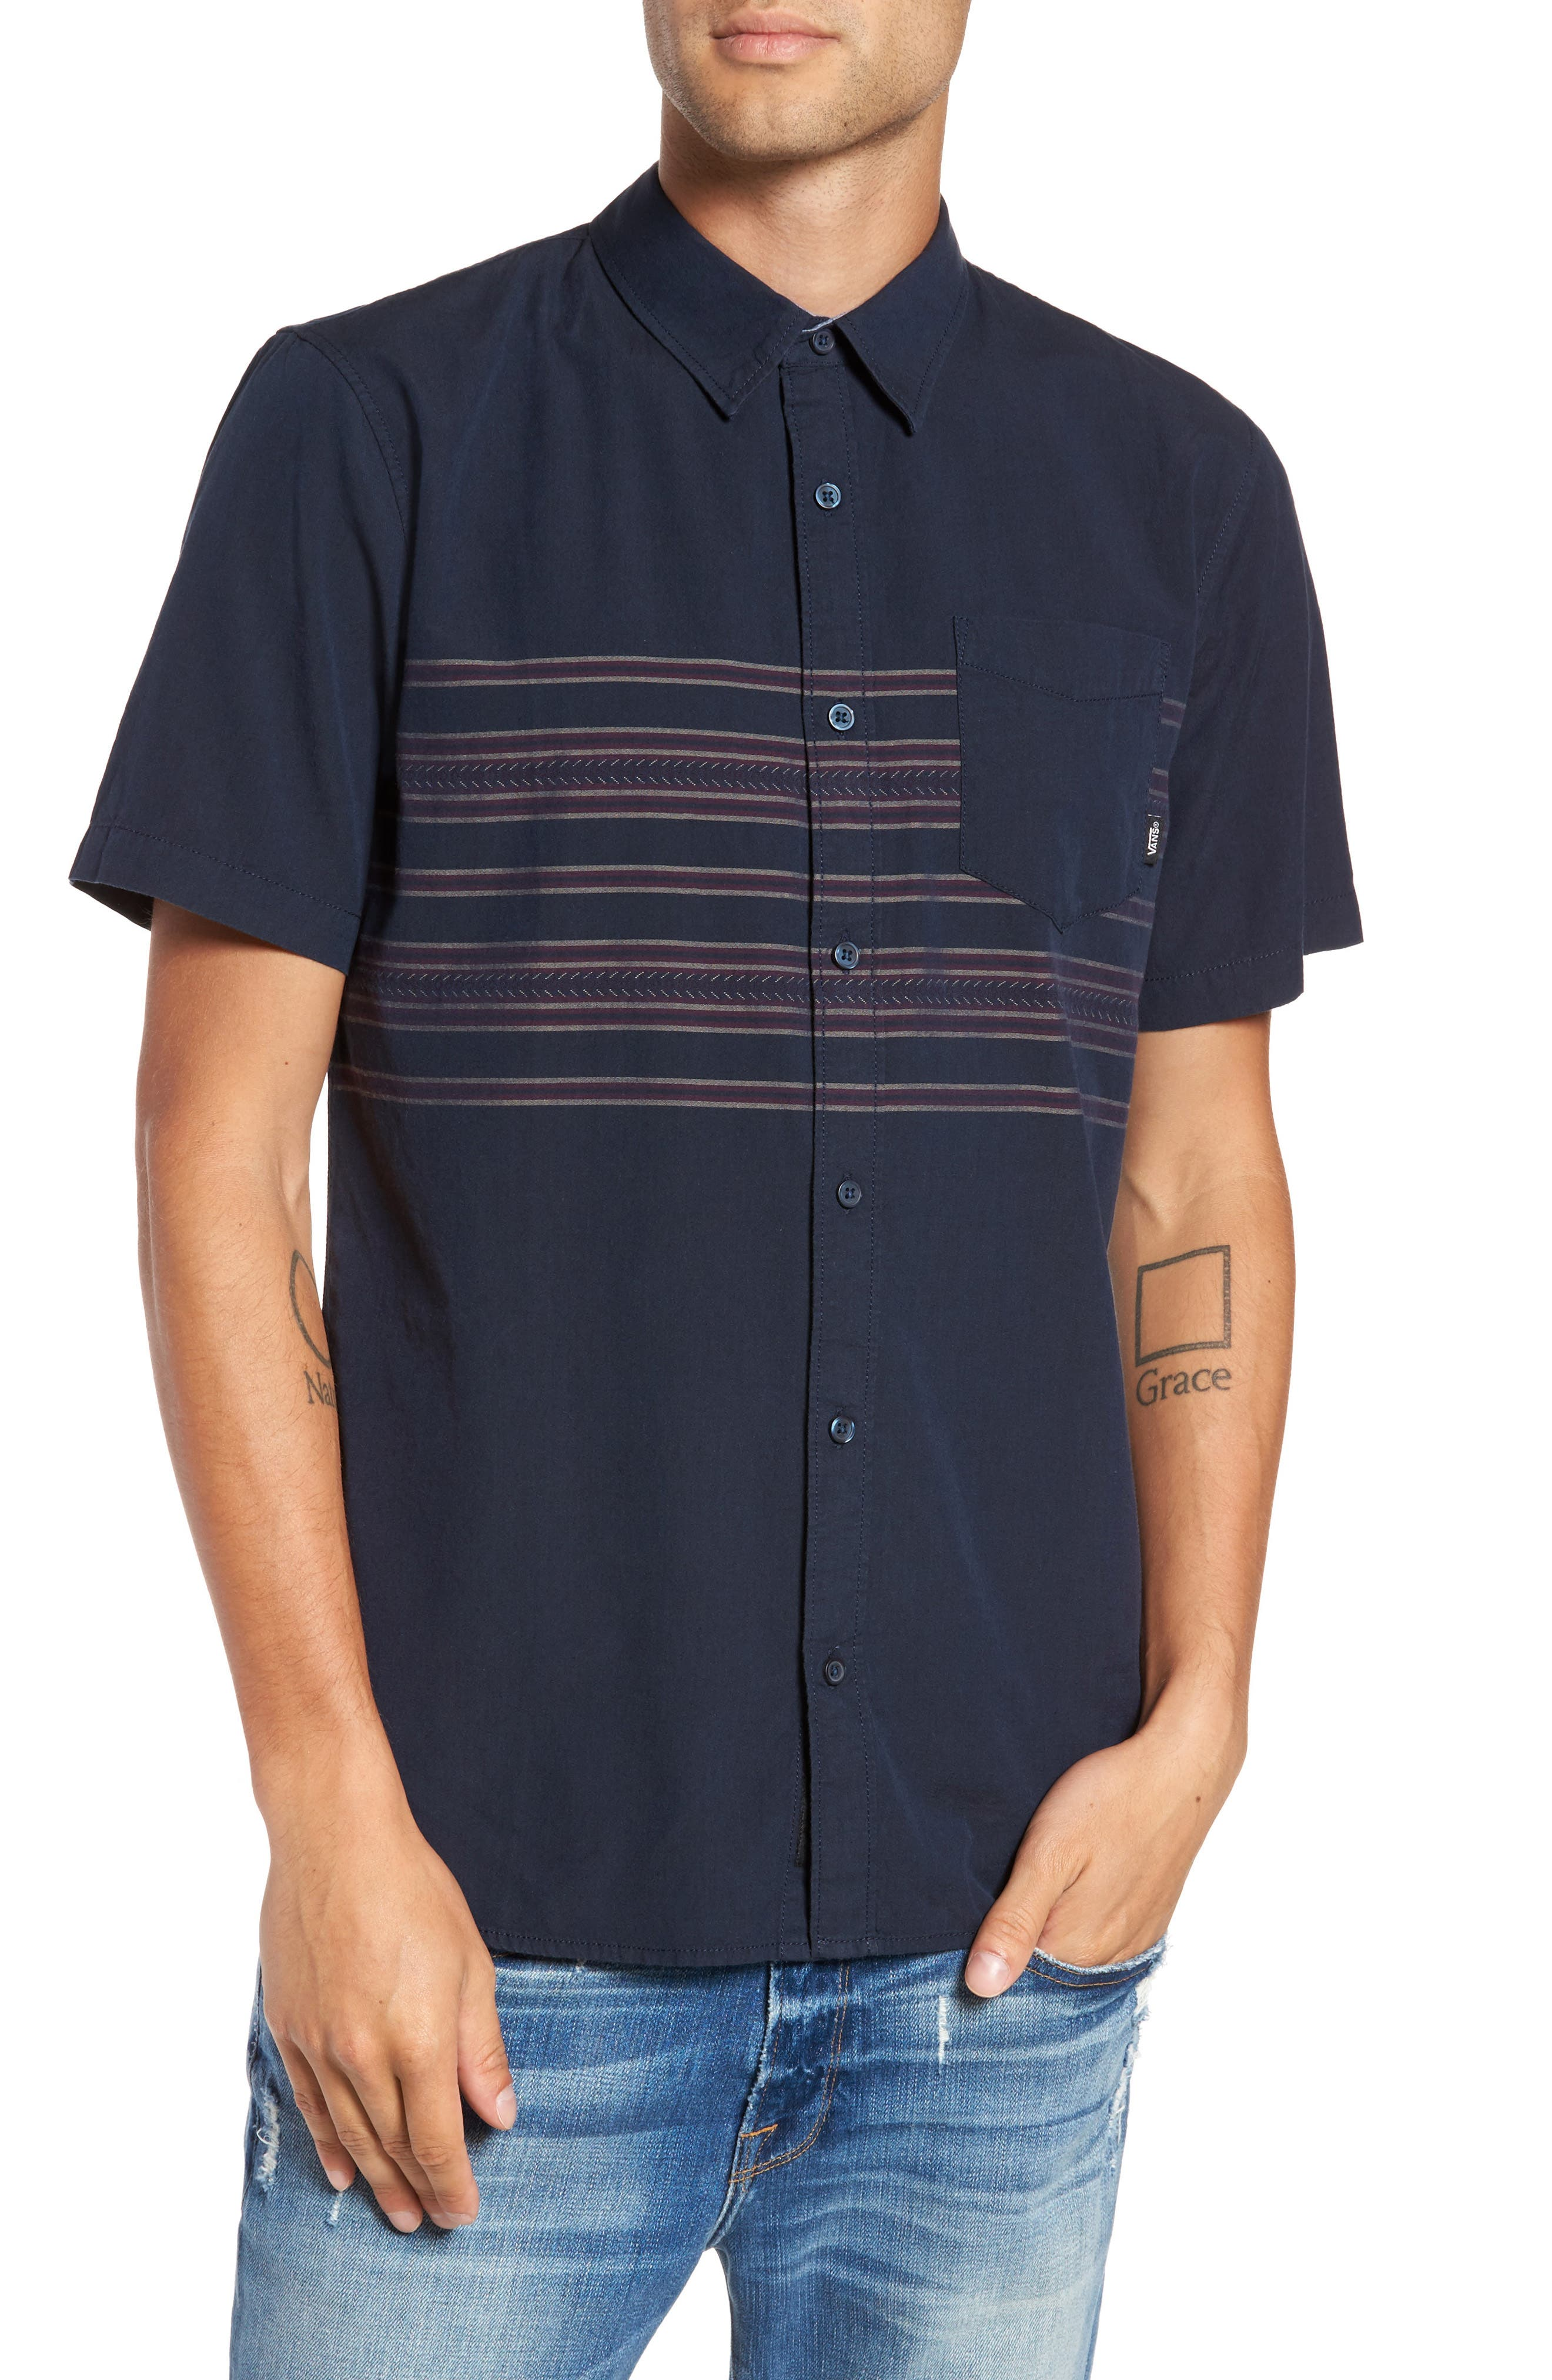 Alternate Image 1 Selected - Vans Benmore Striped Woven Shirt